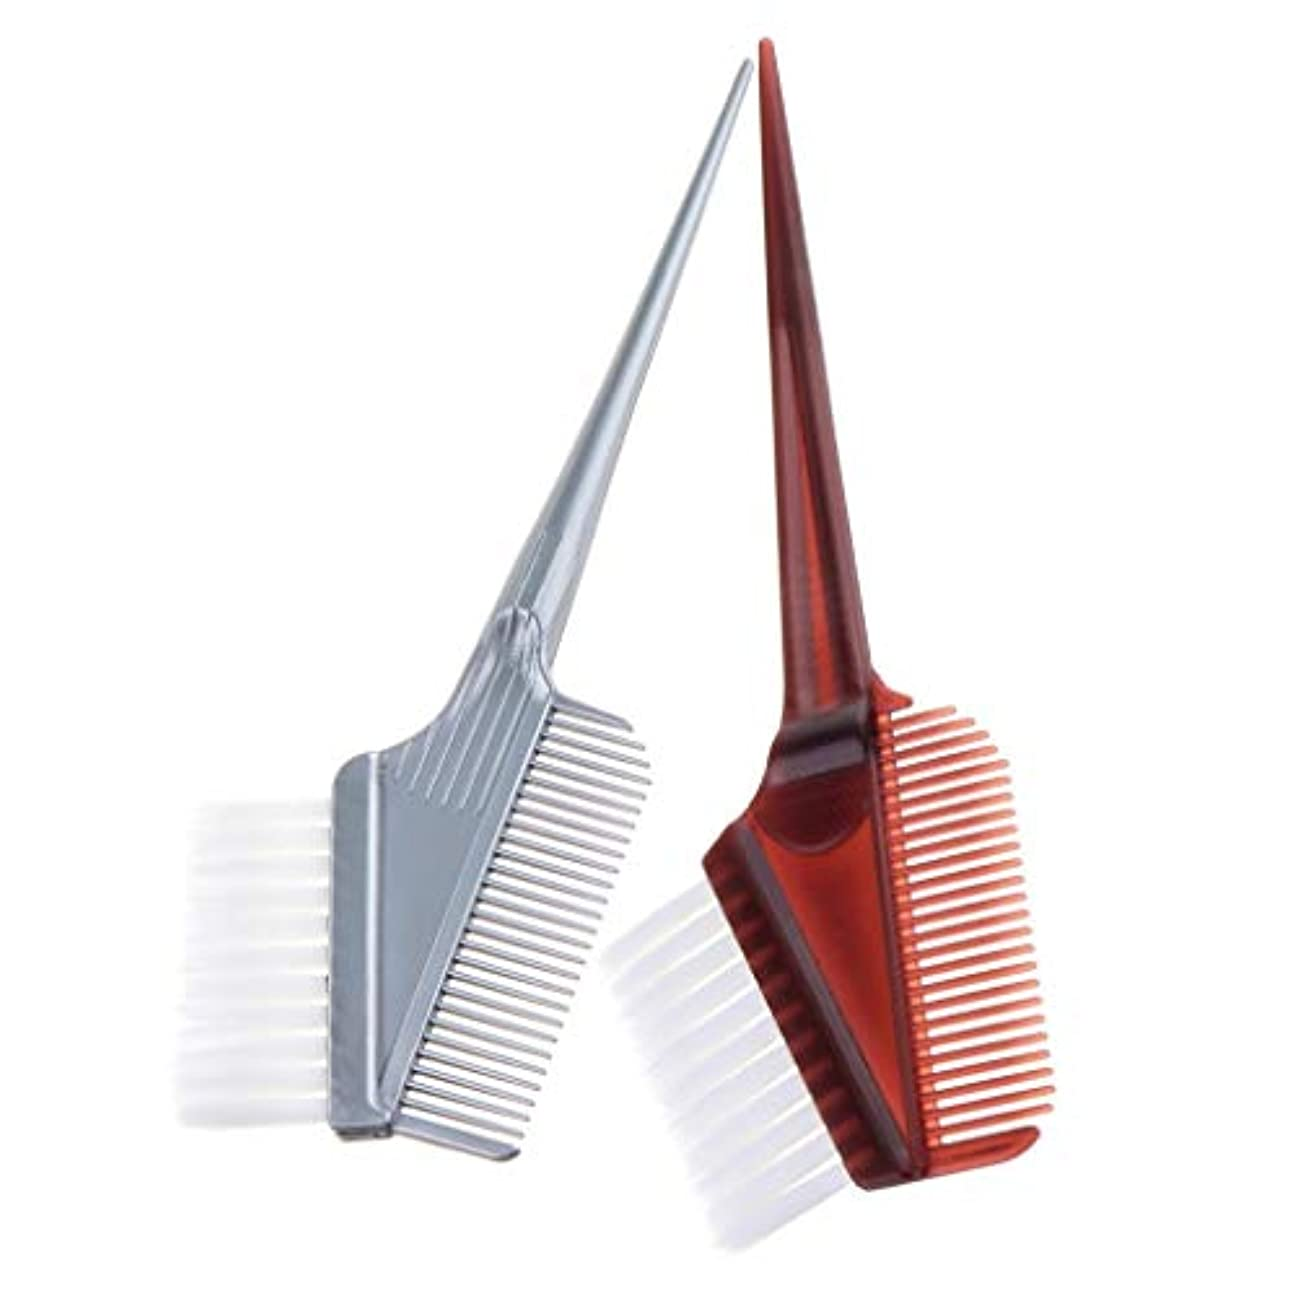 DYNWAVE ヘアダイブラシ ヘアカラー 毛染め ヘアダイコーム 髪染め プラスチック 家庭用 美容師